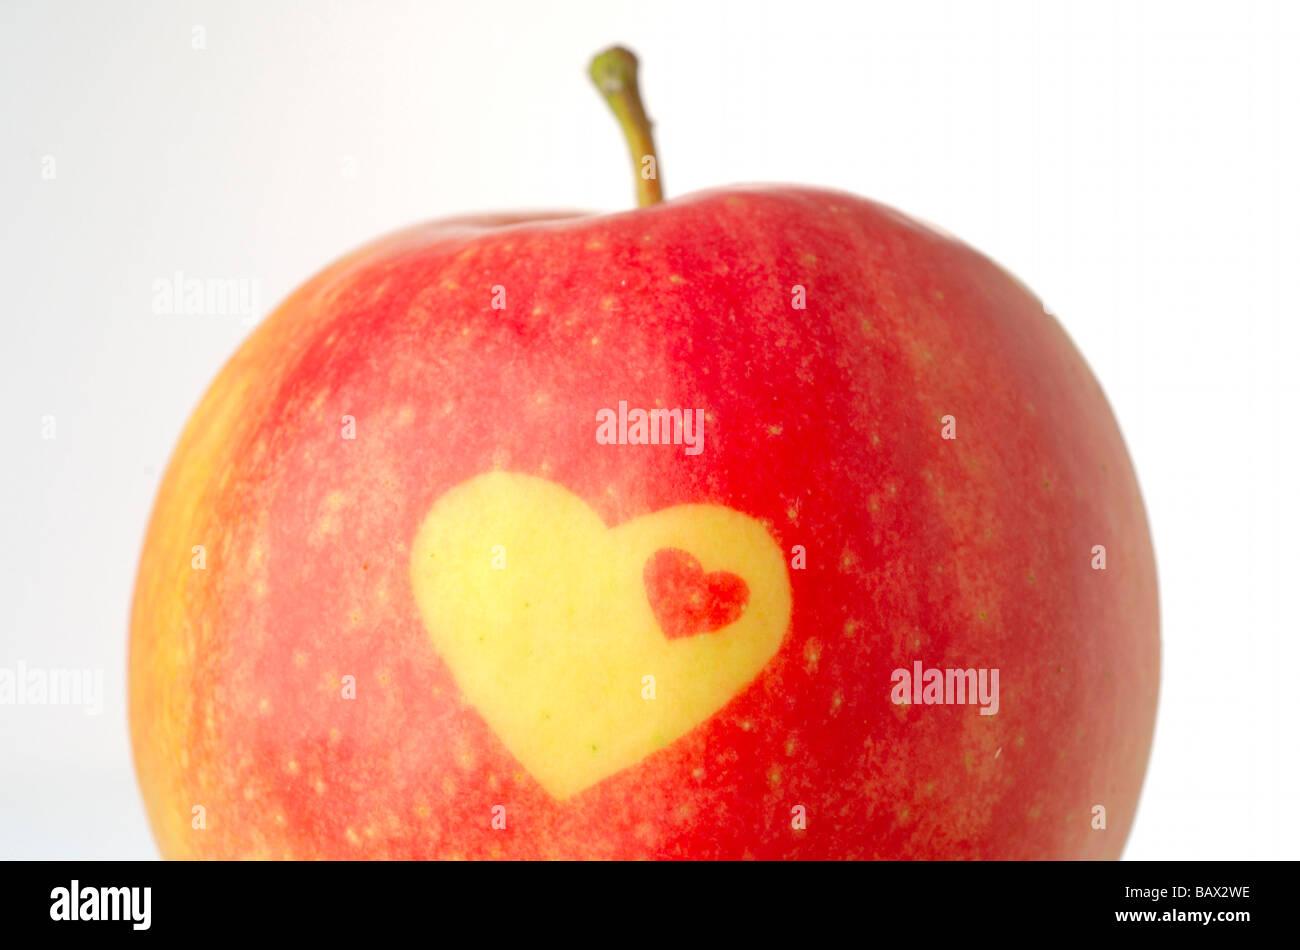 Apfel mit dekorativen Wärme form Stockbild